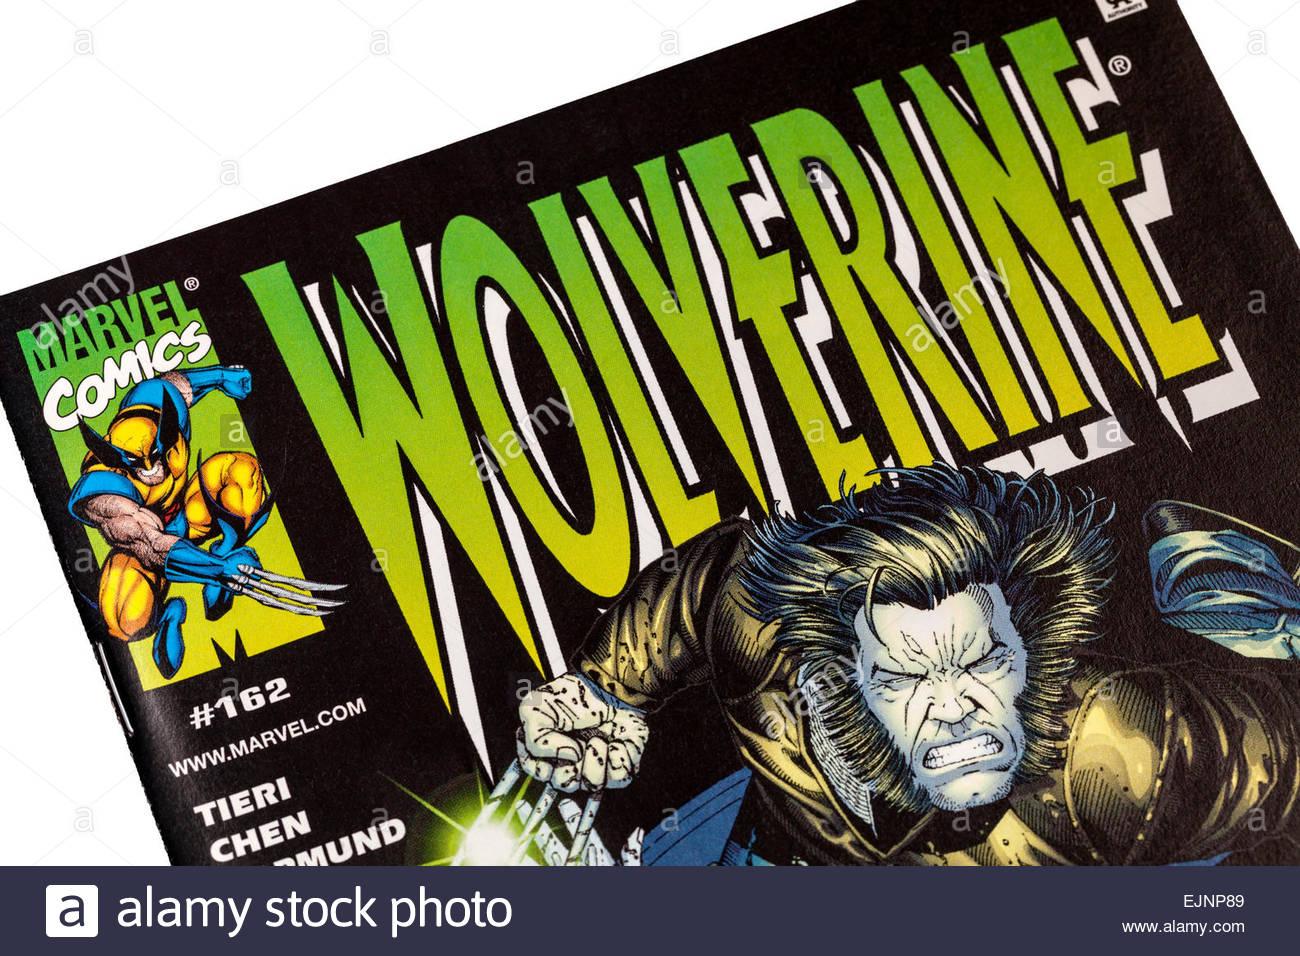 Wolverine Comic Stock Photos Wolverine Comic Stock Images Alamy